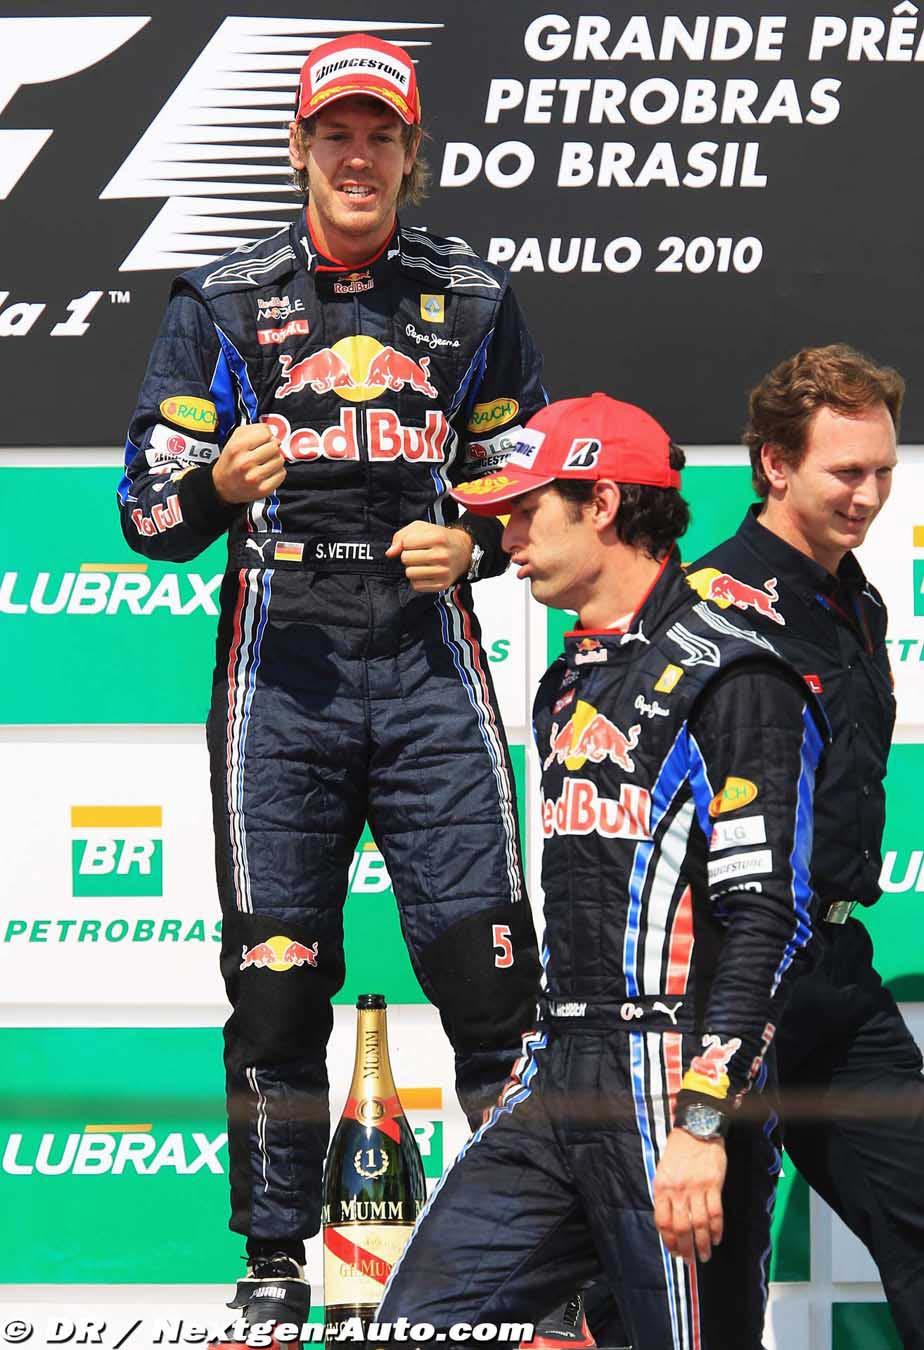 Себастьян Феттель Марк Уэббер и Кристиан Хорнер на подиуме Гран-при Бразилии 2010